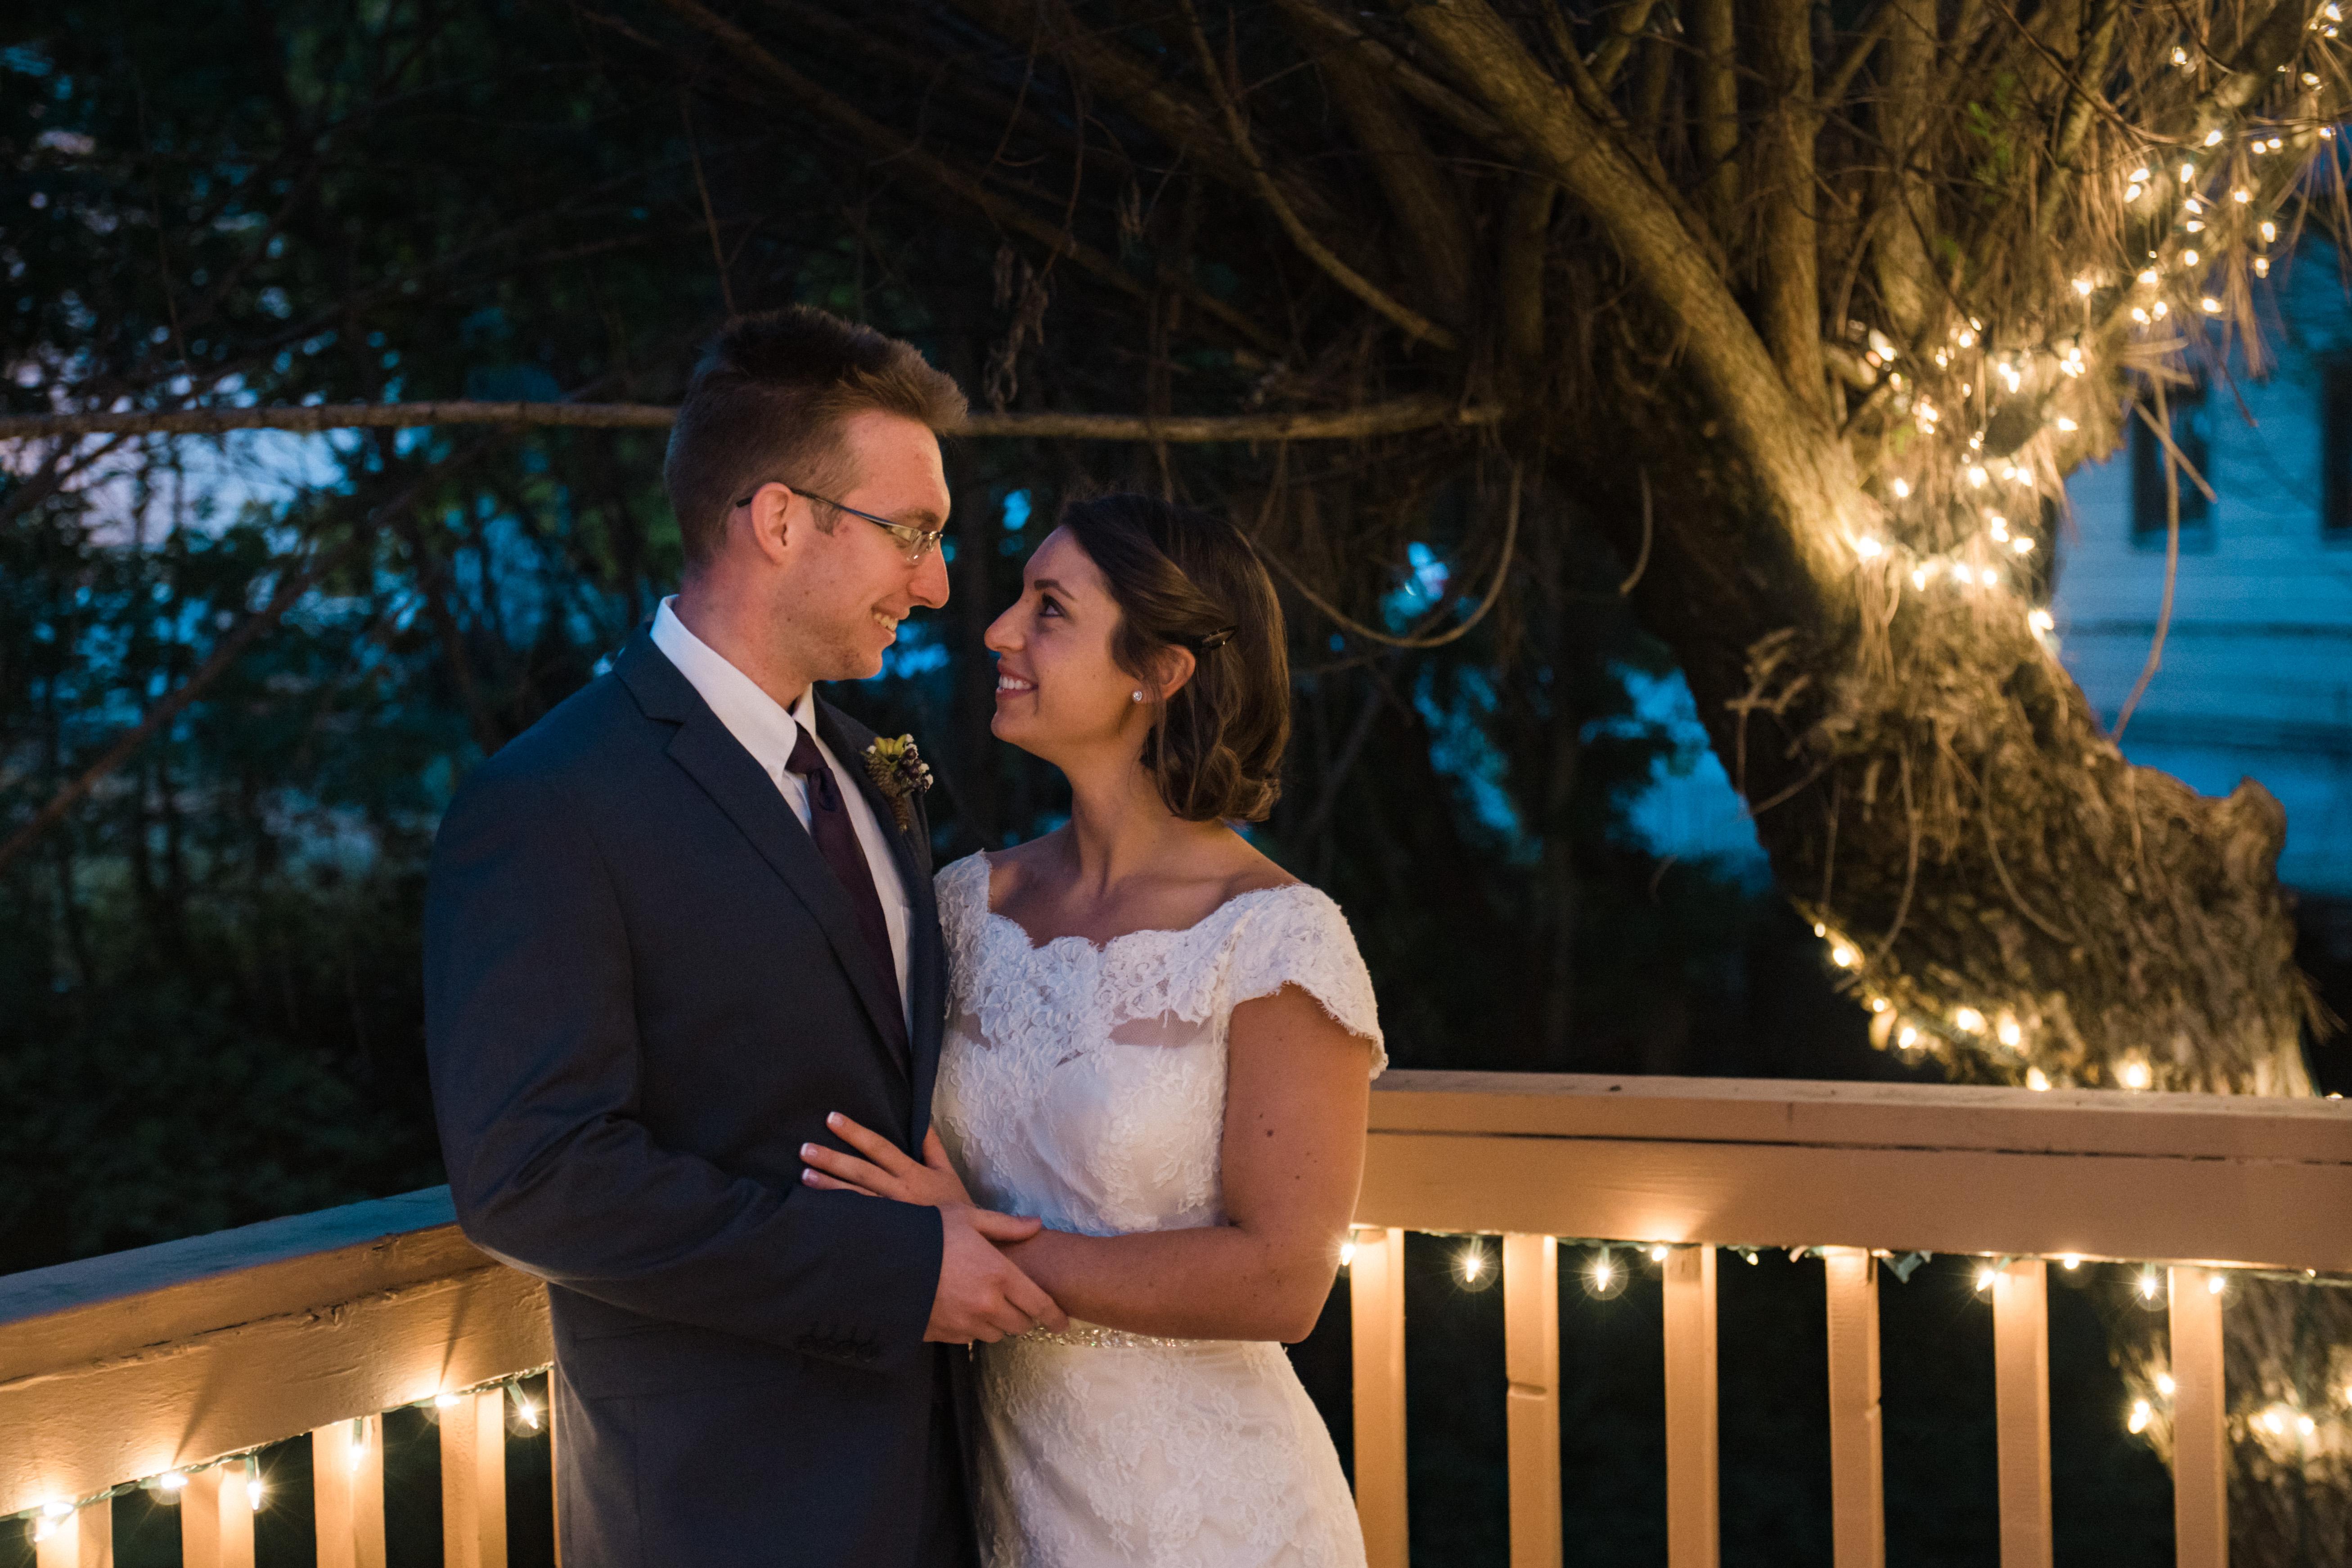 Summer Succulent Wedding, Spokane Wedding, Spokane Summer Wedding, Hannah + Scott, Hannah & Scott, Commellini Estate, Event Venue, Wedding Venue